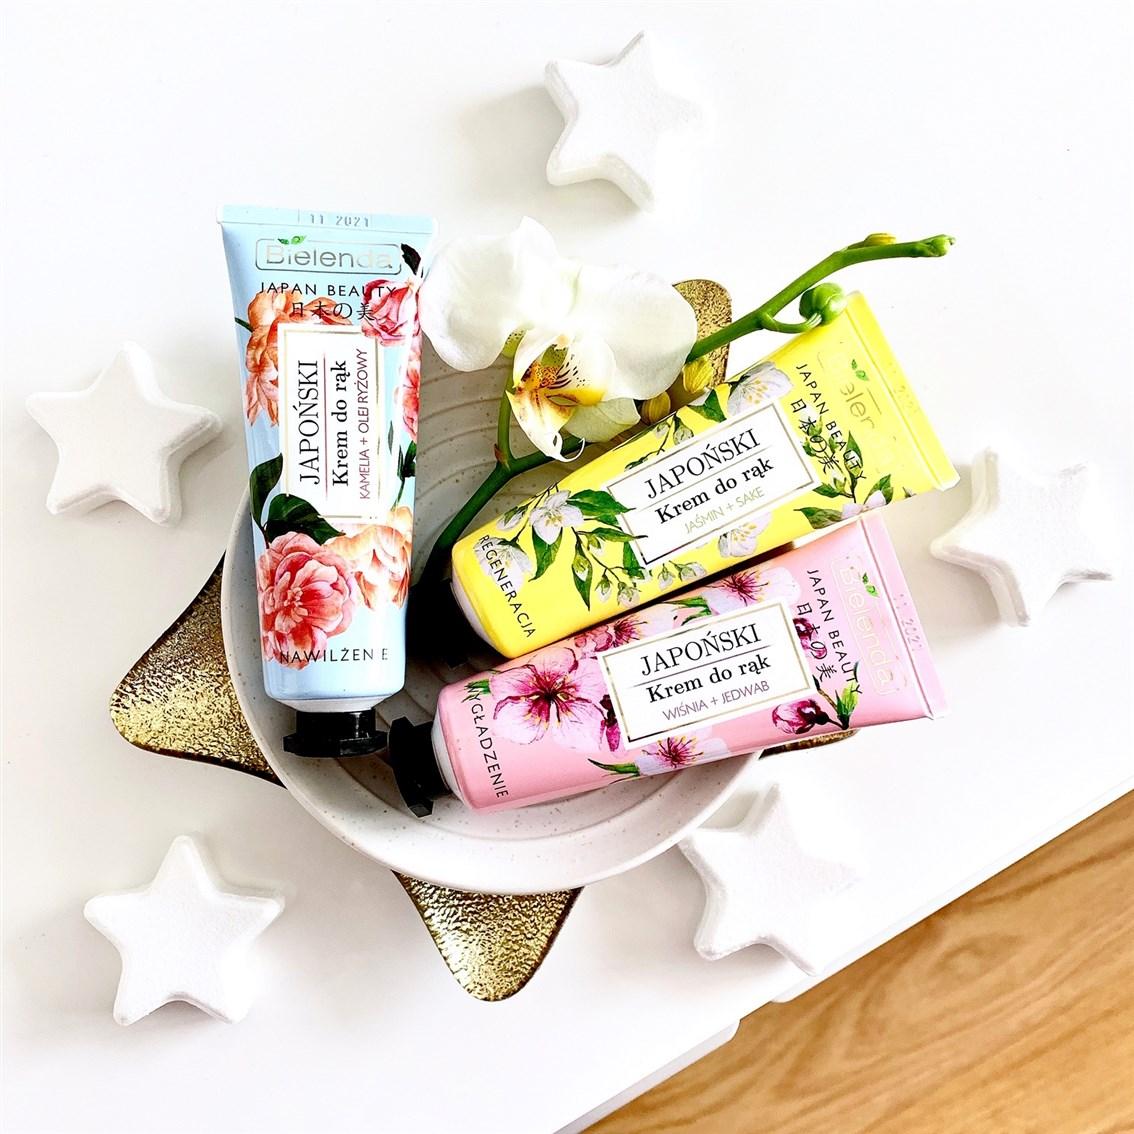 Bielenda Japan Beauty japońskie kremy do rąk